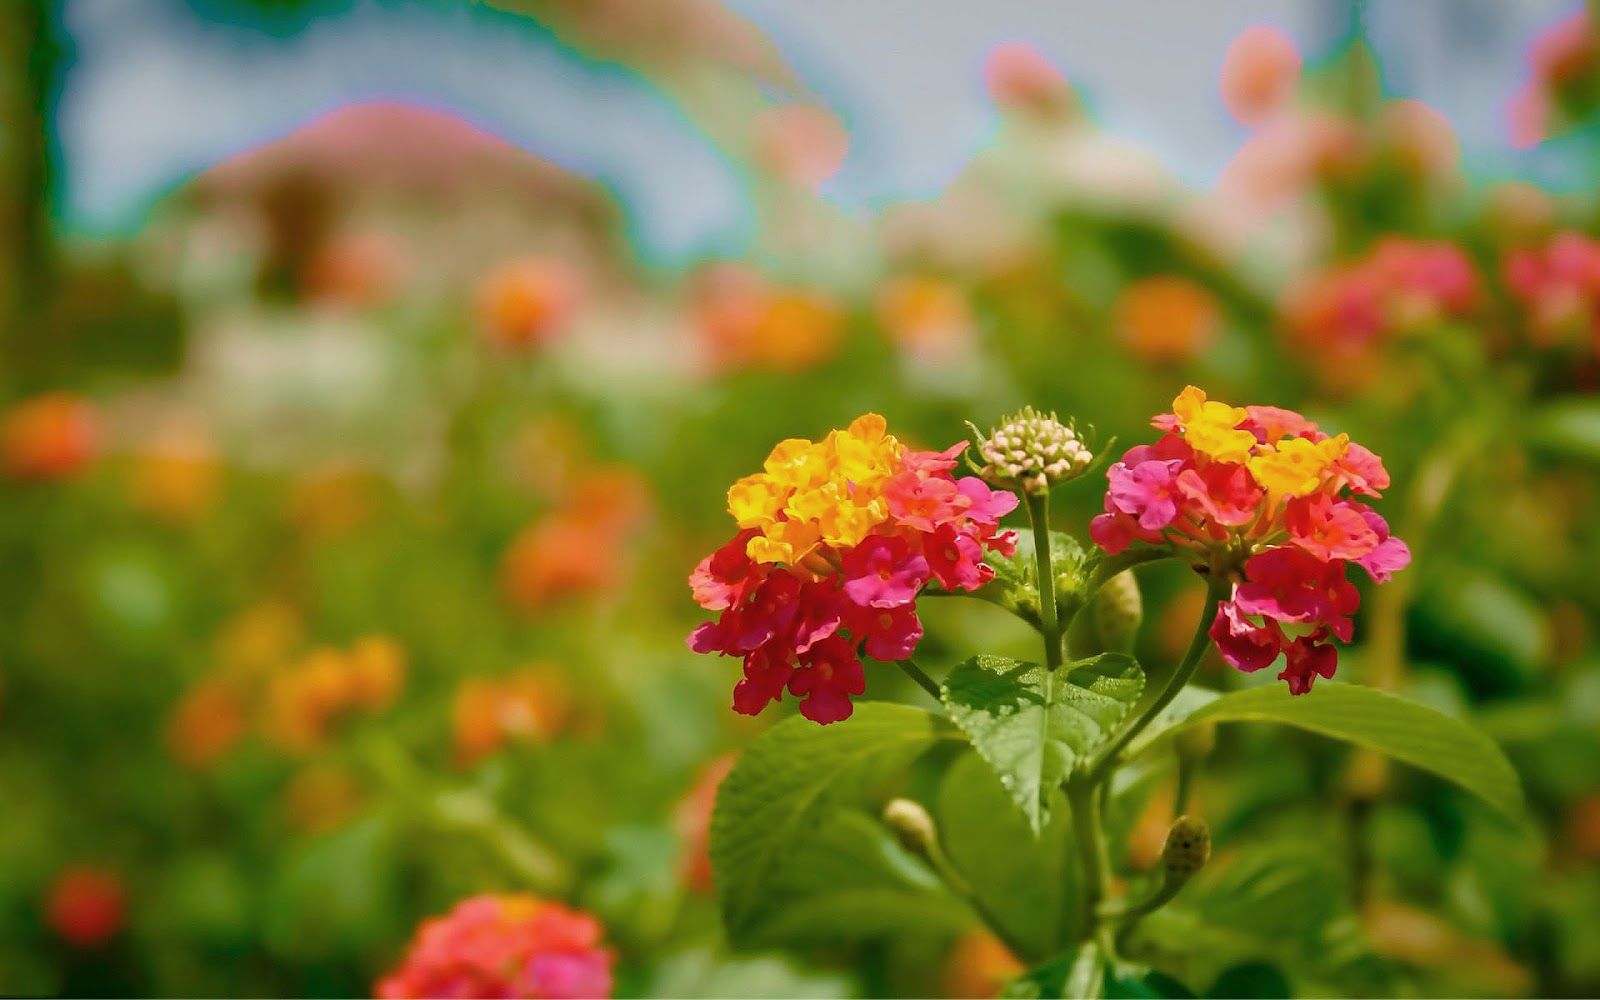 Smiley Full Hd Wallpaper And Achtergrond: Leuke Achtergrond Met Bloemen